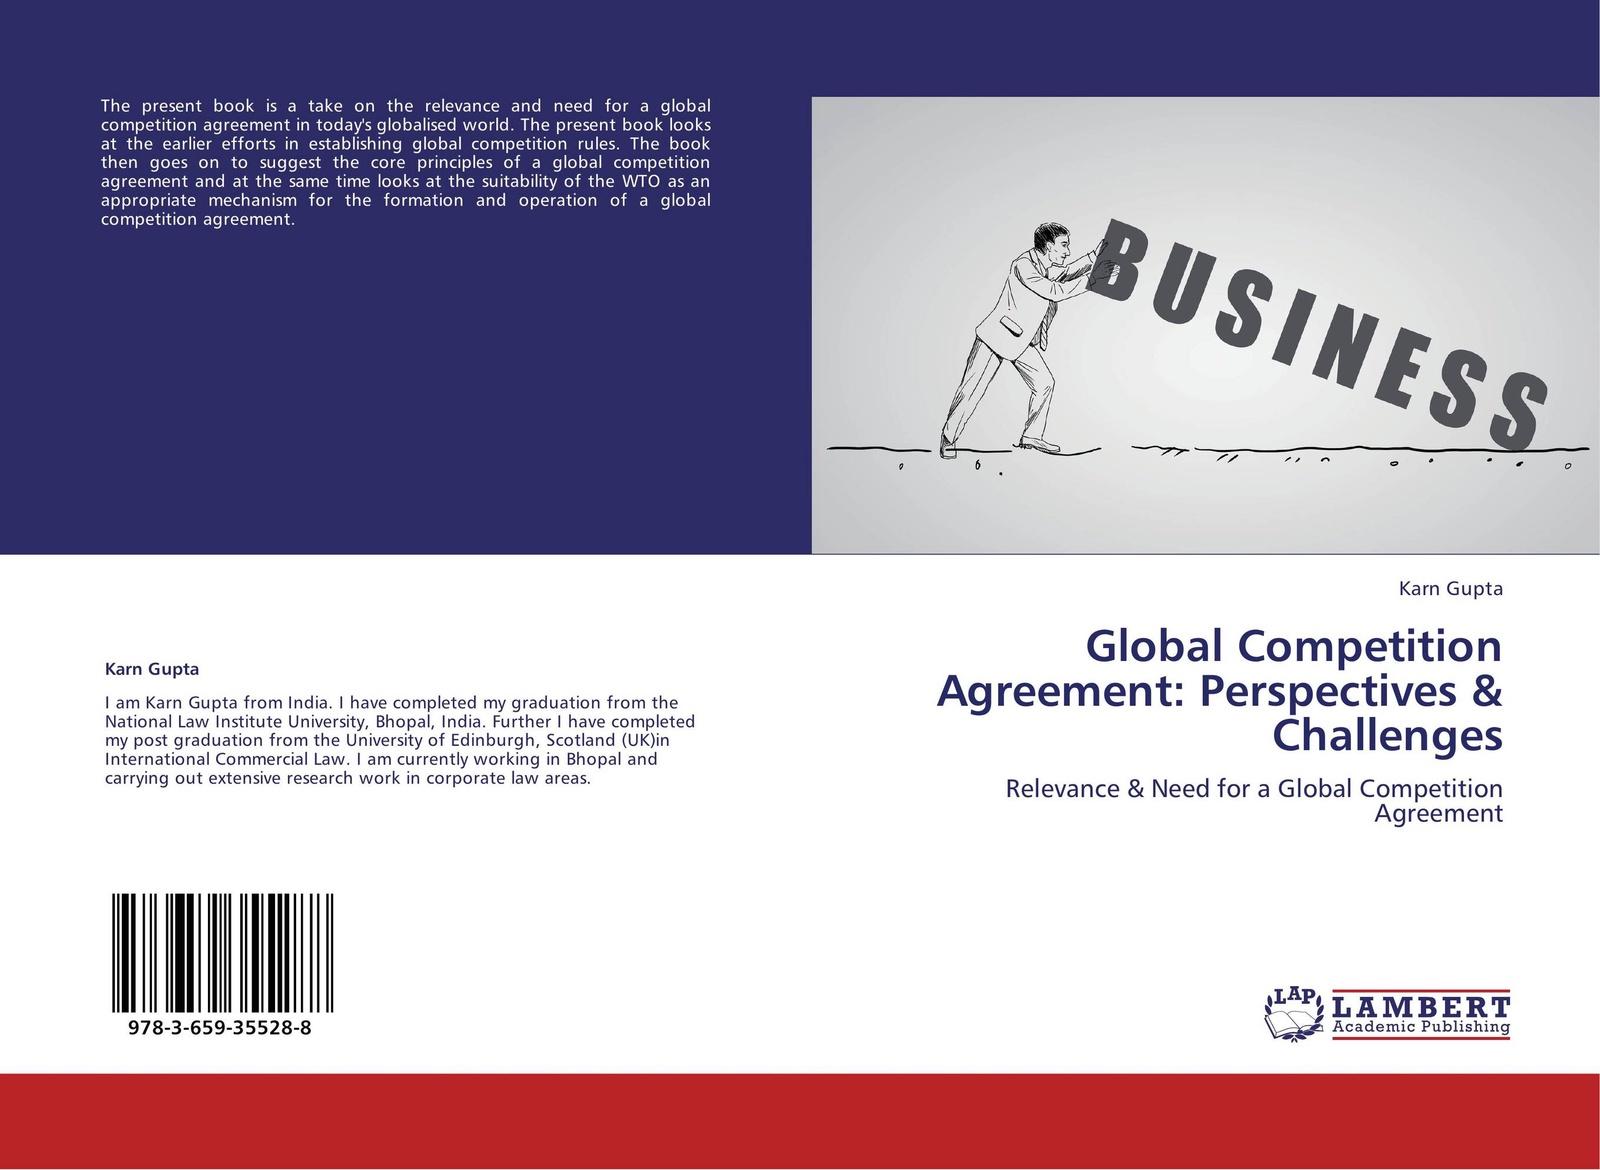 лучшая цена Karn Gupta Global Competition Agreement: Perspectives & Challenges